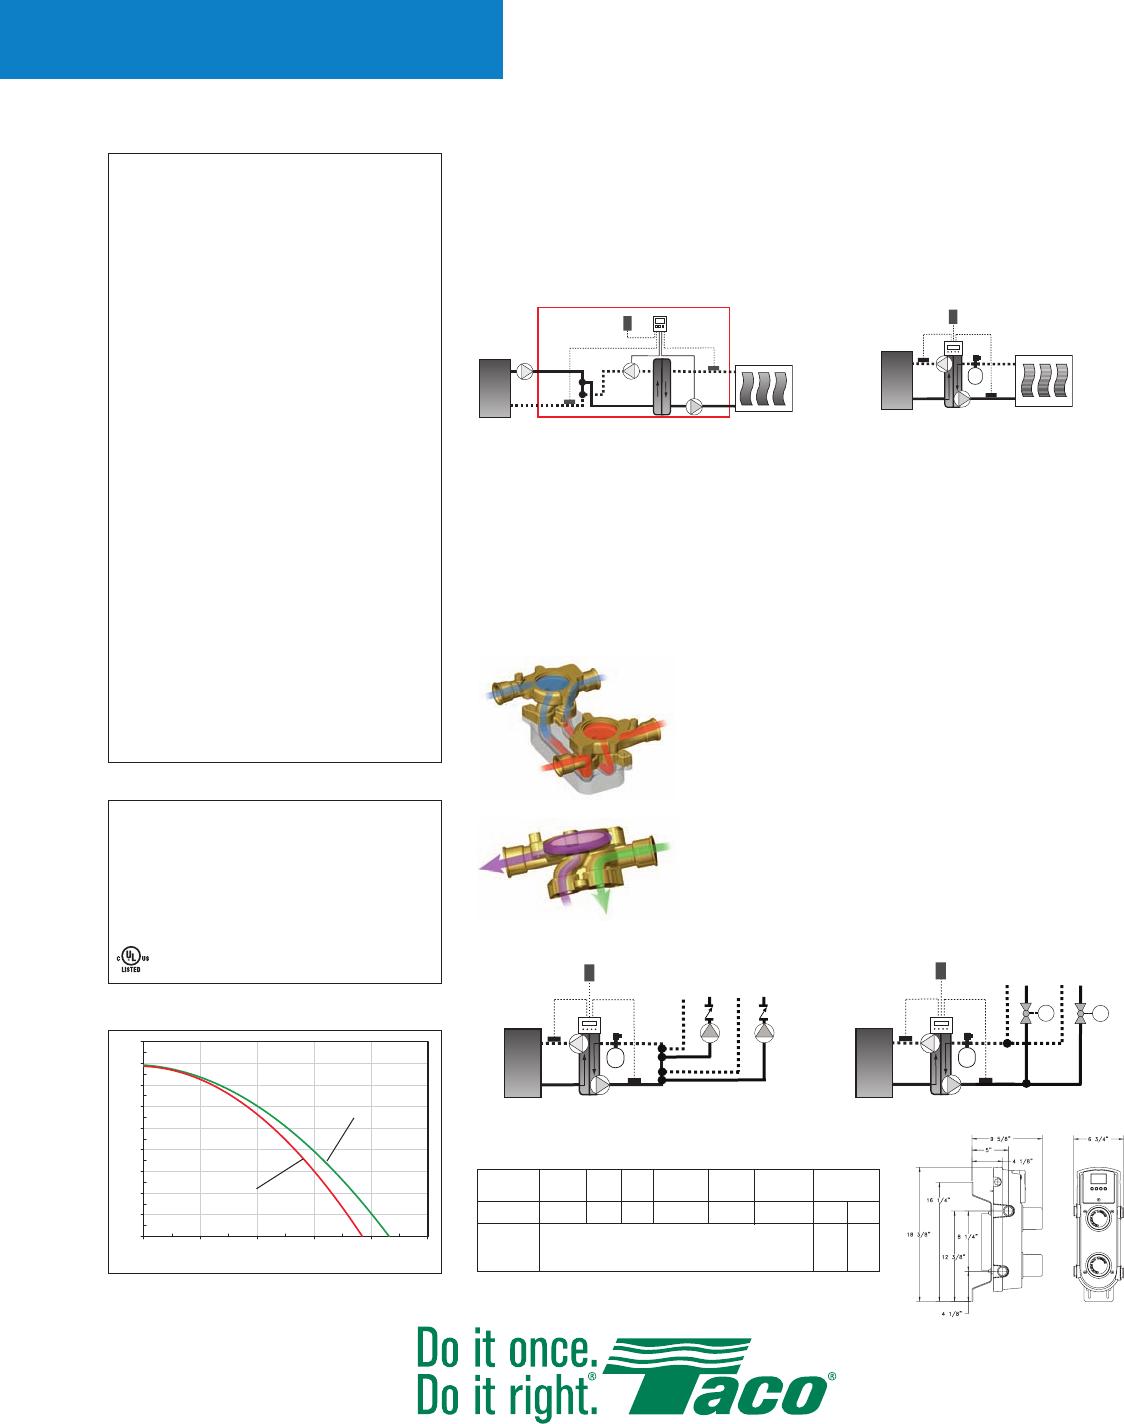 12910 1 Taco 193 024rp Brochure Tac 5682 X Pump User Manual 111 Wiring Diagram Application